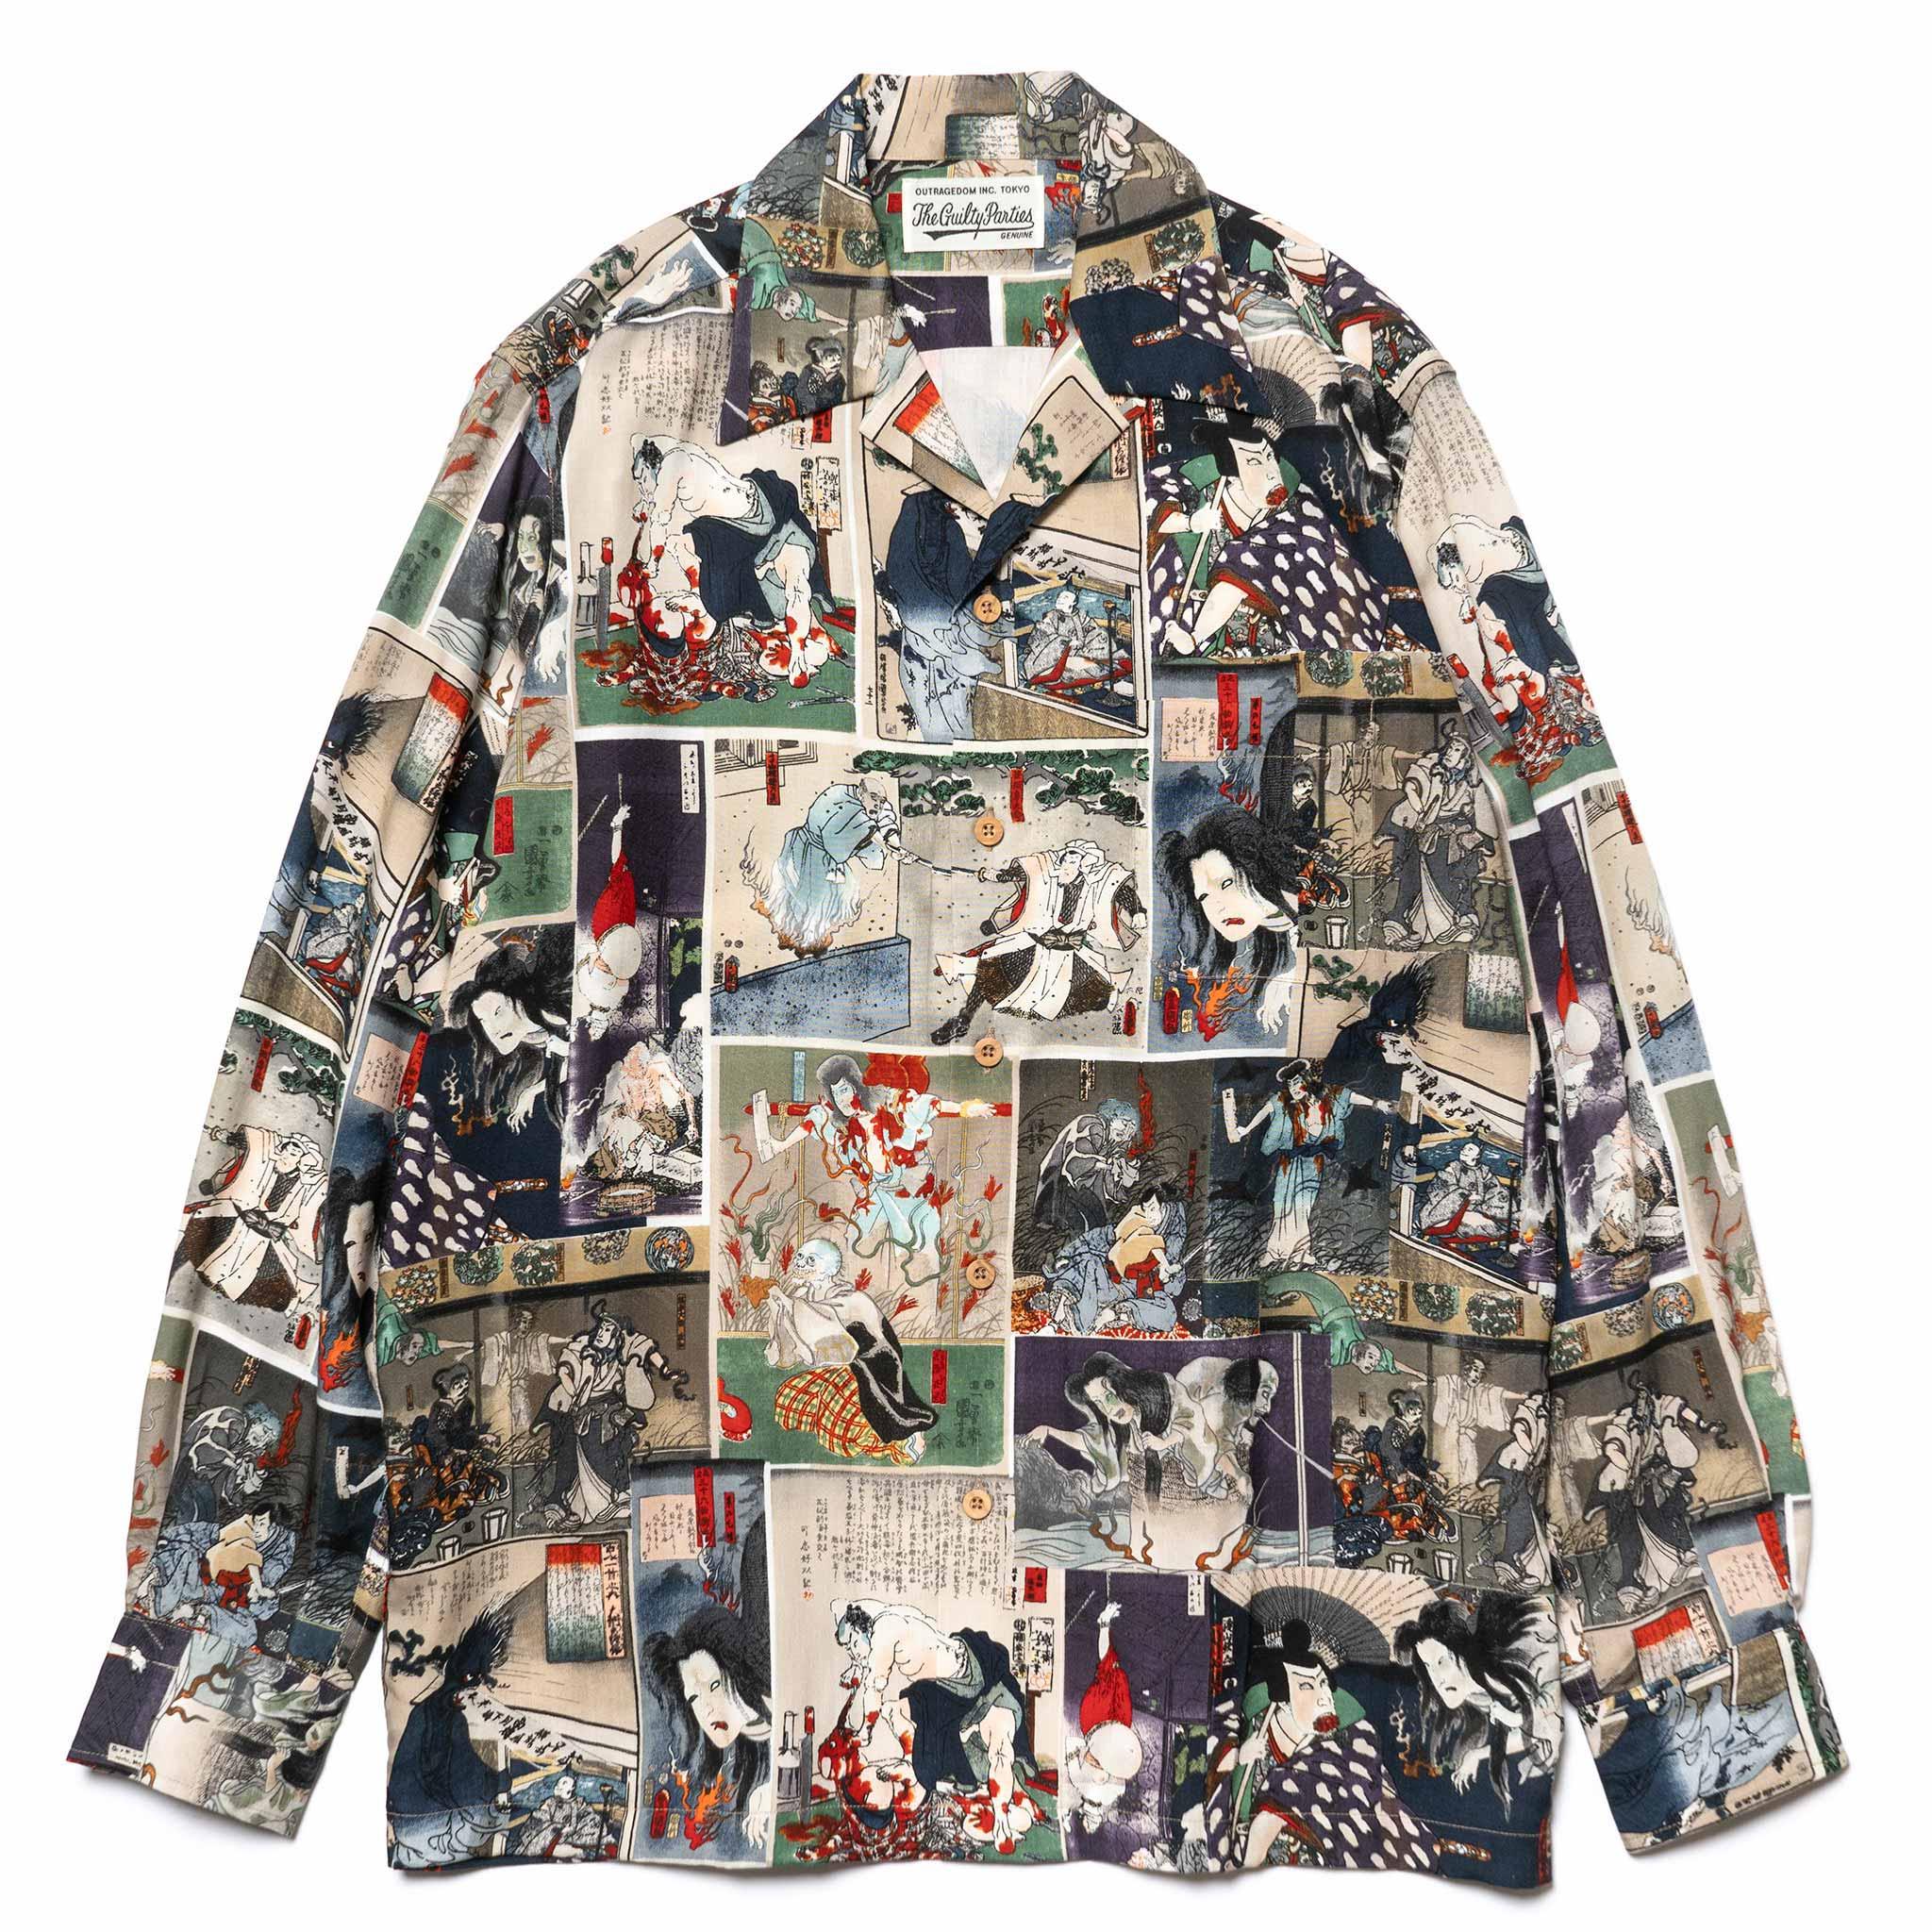 3e802a3c WACKO MARIA's Hawaiian Shirt with Guro Japanese Prints | HAVEN